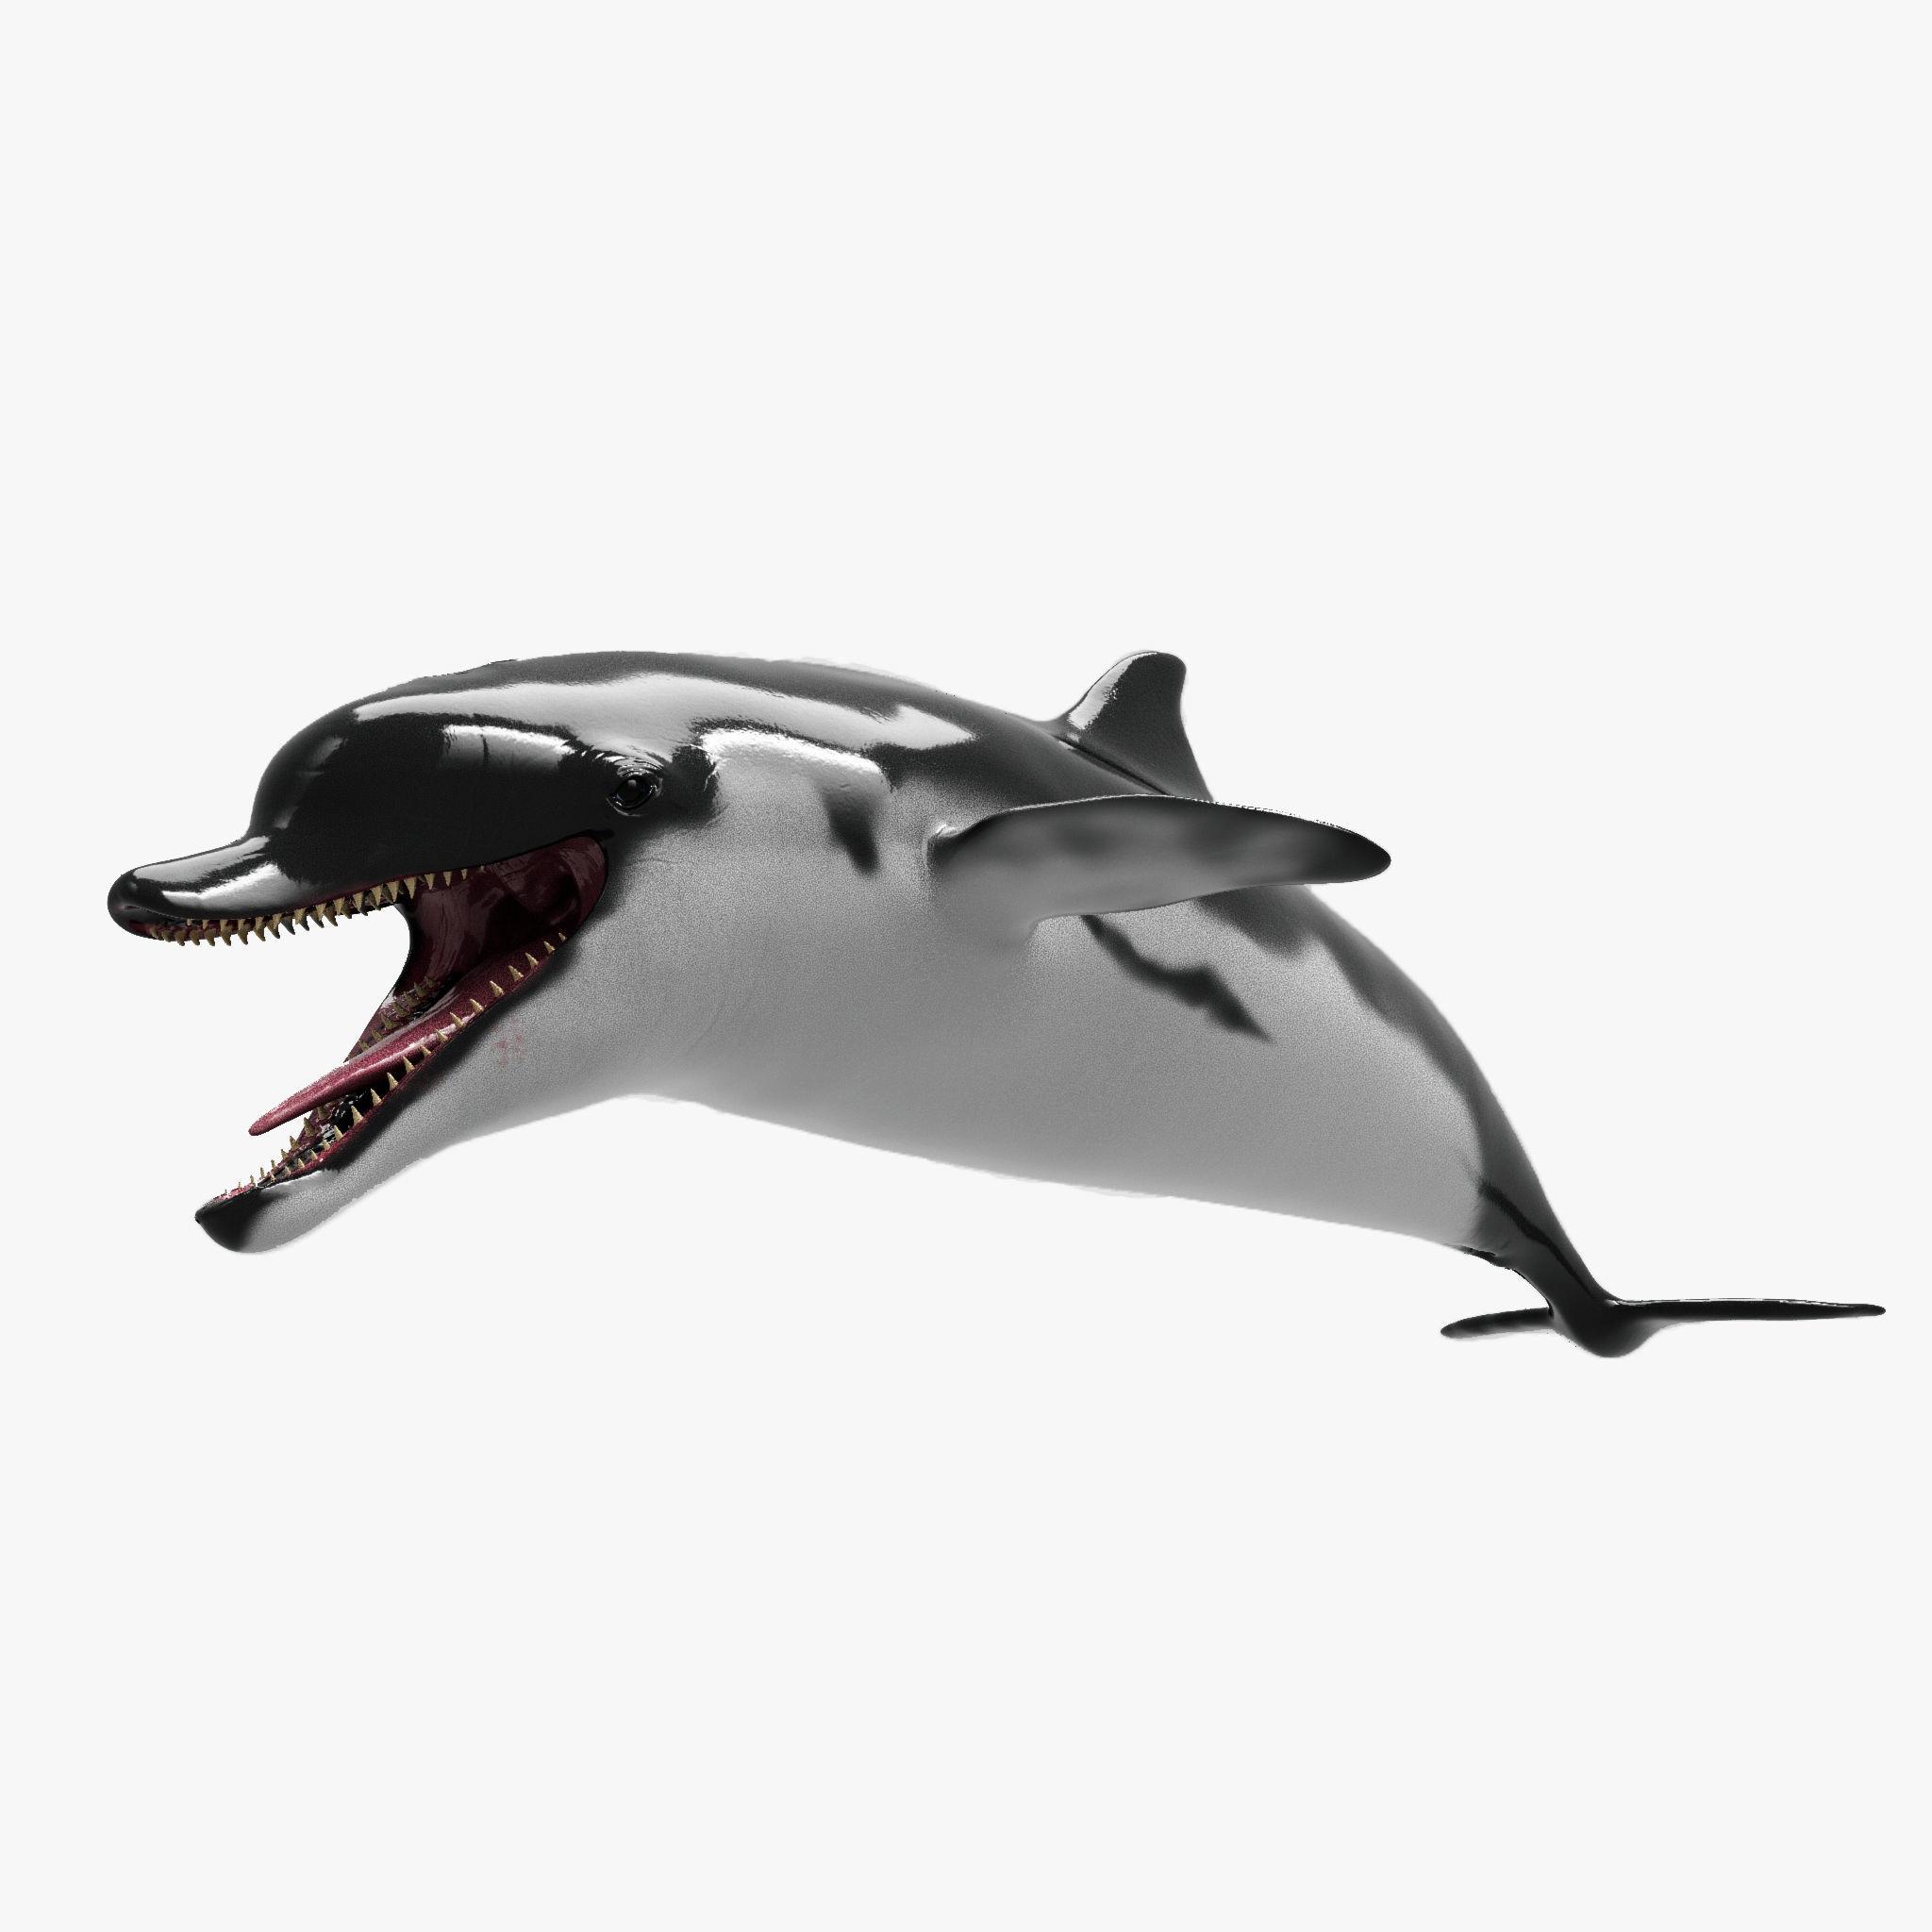 Dolphin Sculpt